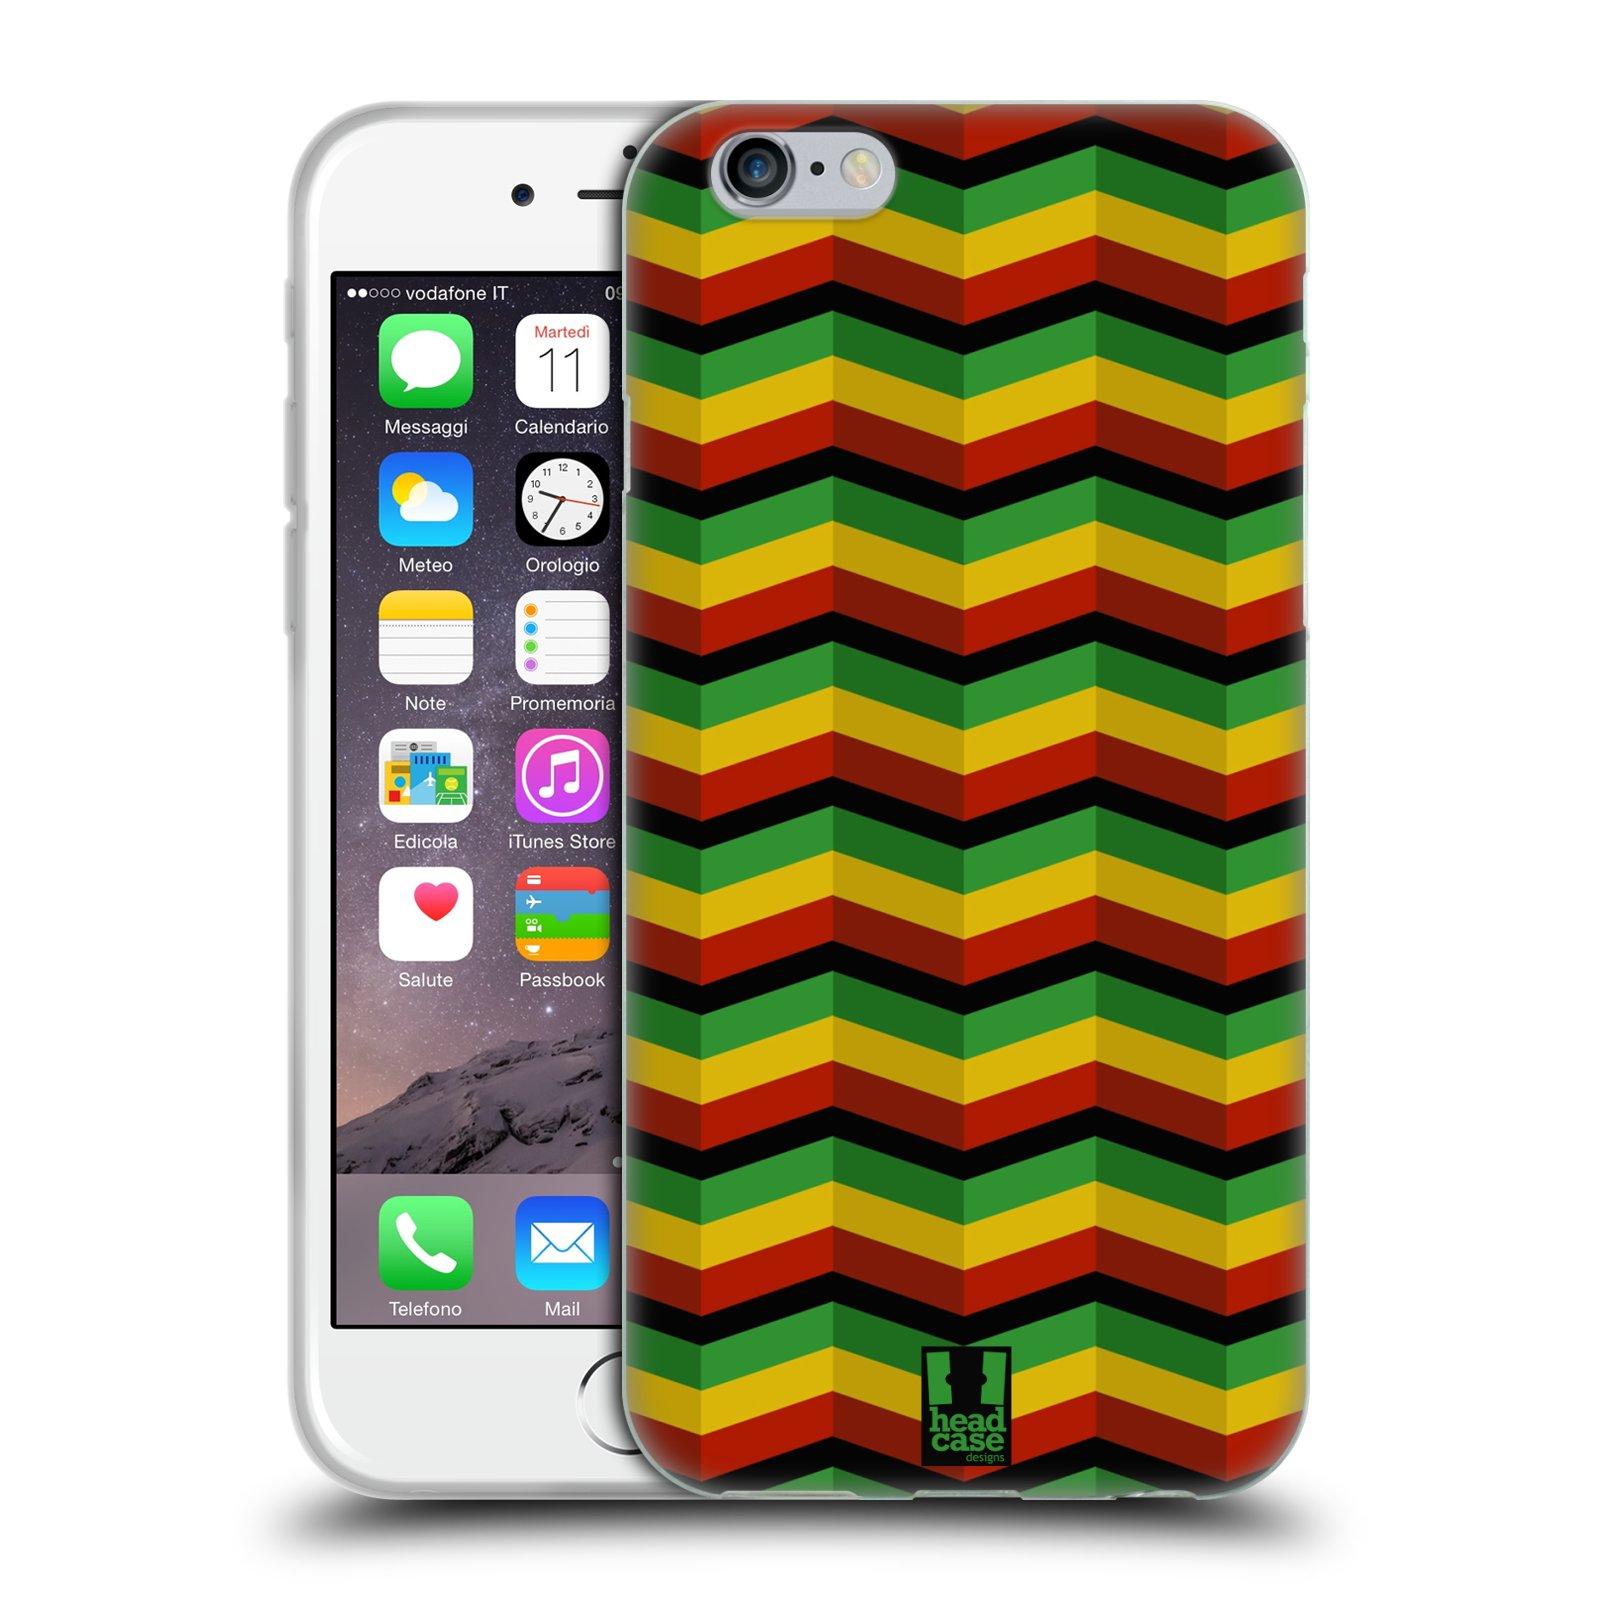 HEAD CASE silikonový obal na mobil Apple Iphone 6/6S vzor Rasta barevné vzory CHEVRON